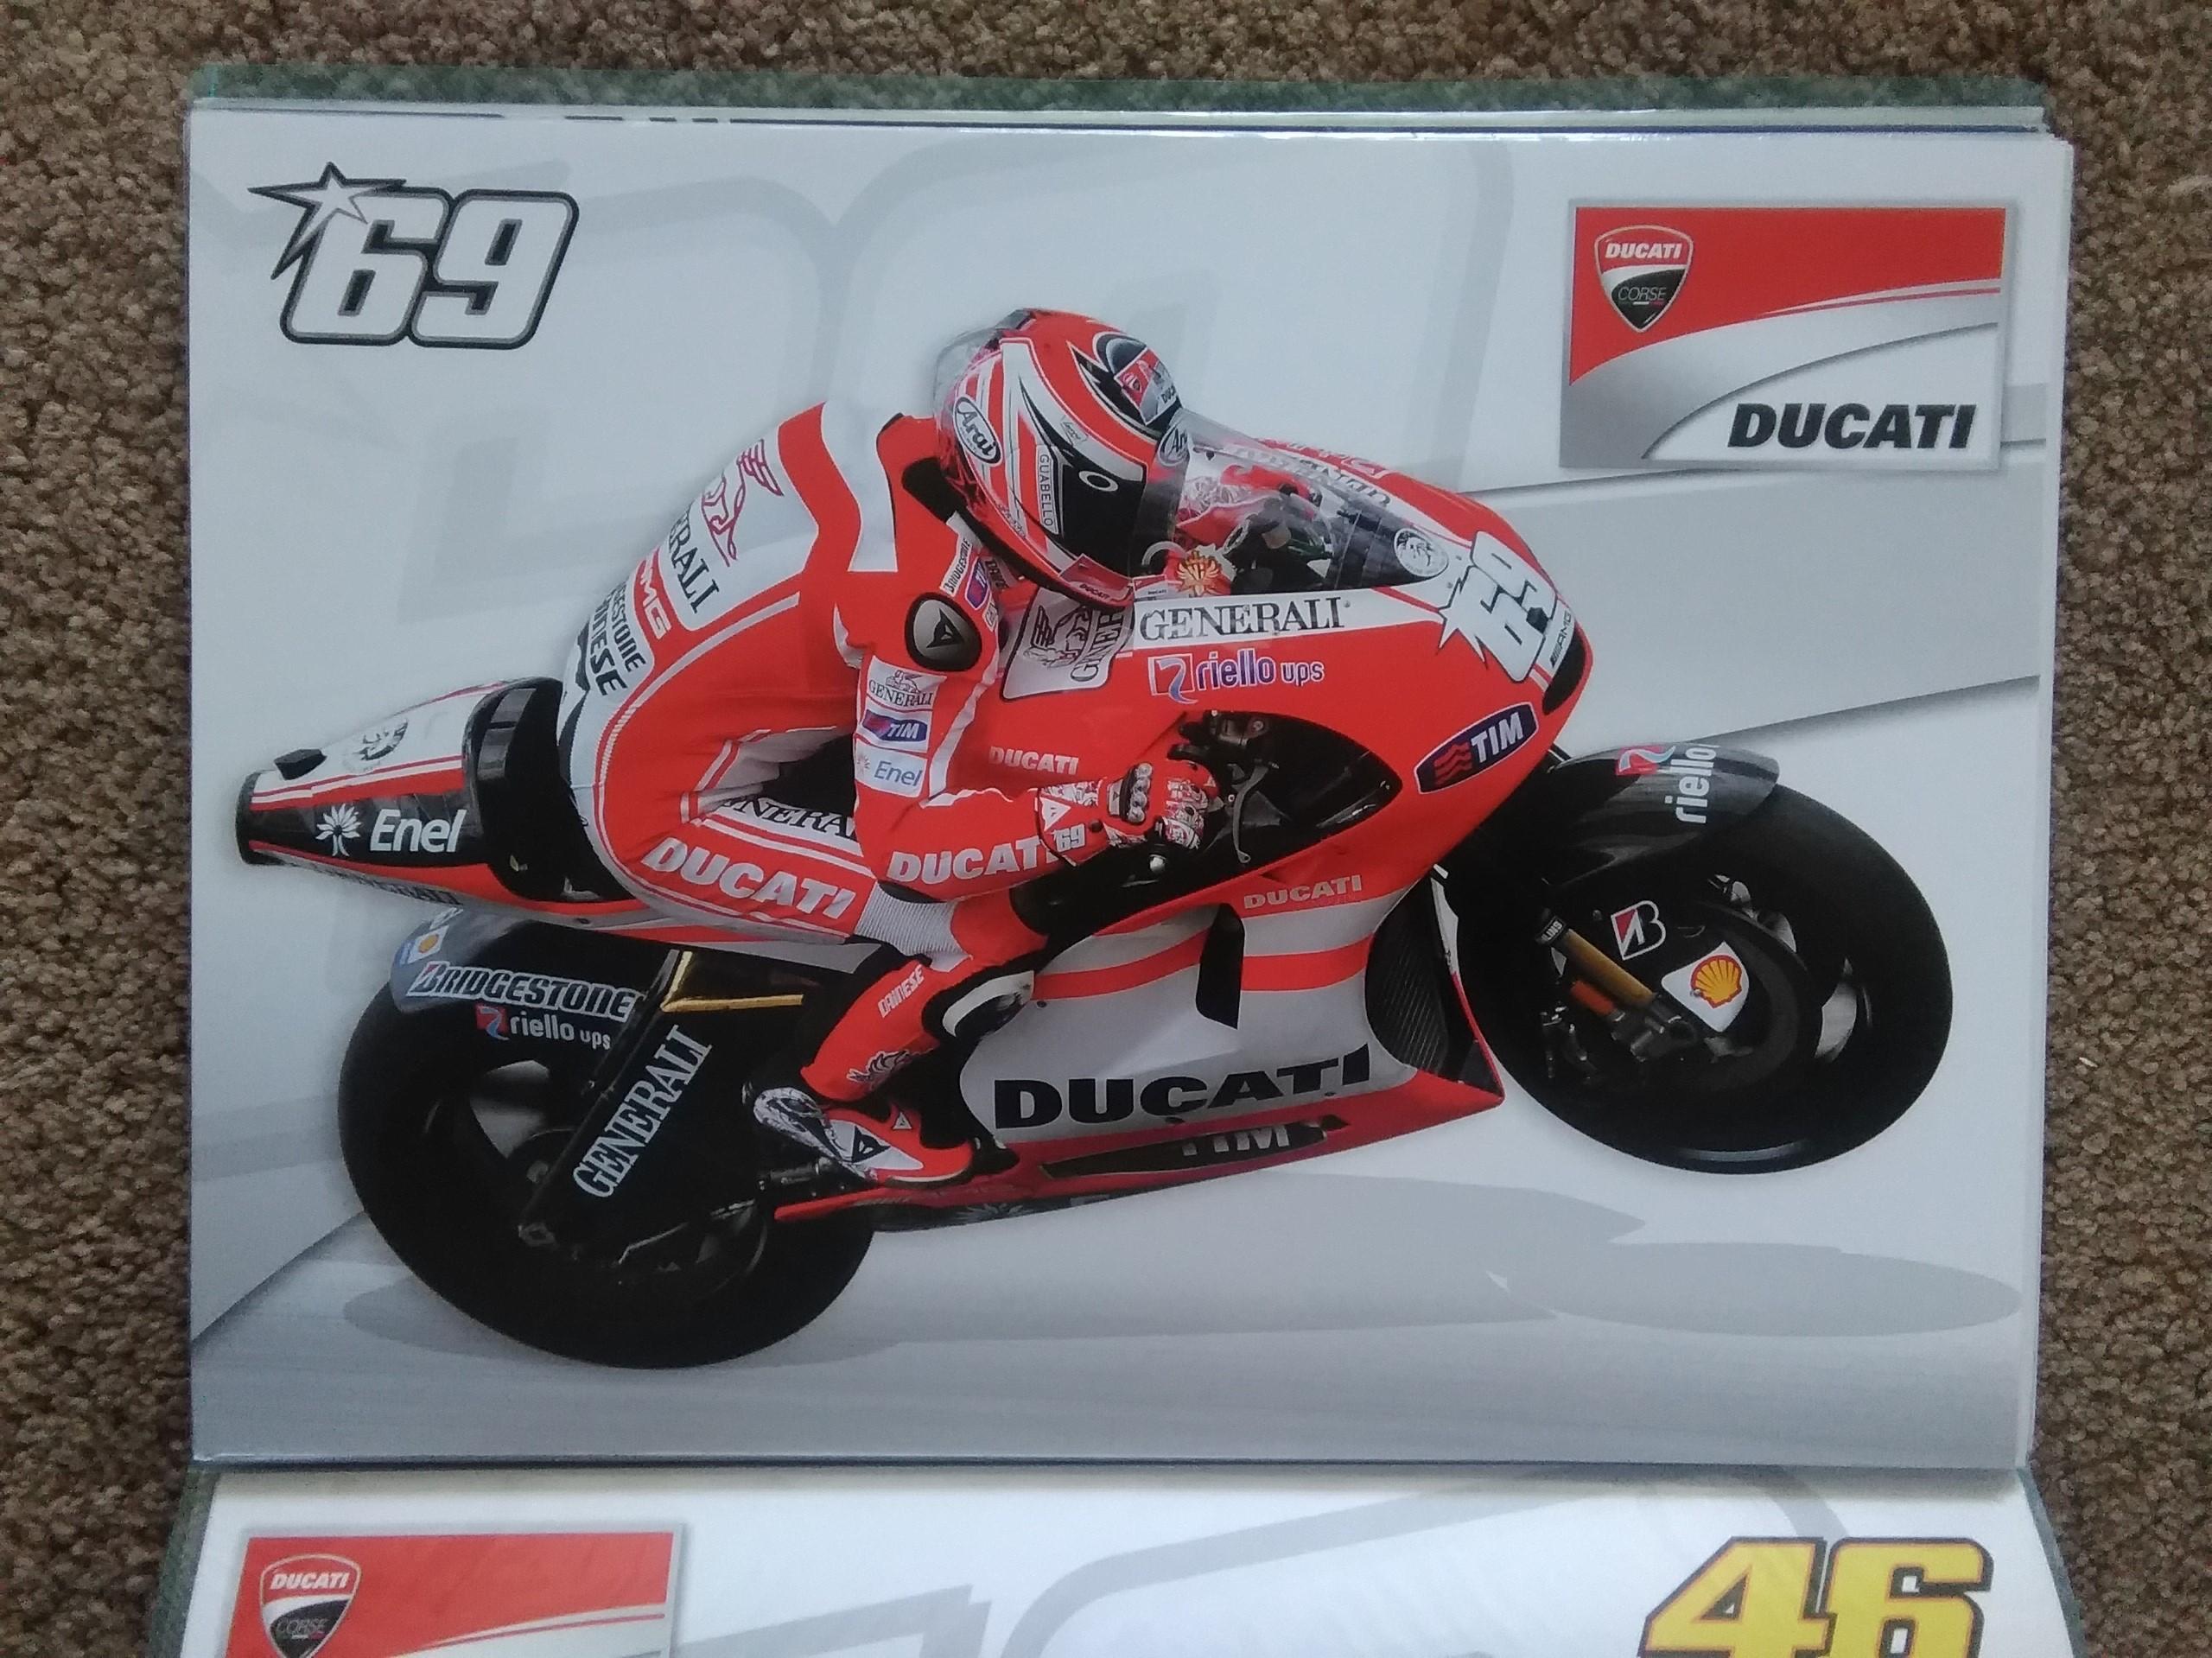 Nicky Hayden Ducati Moto GP Poster